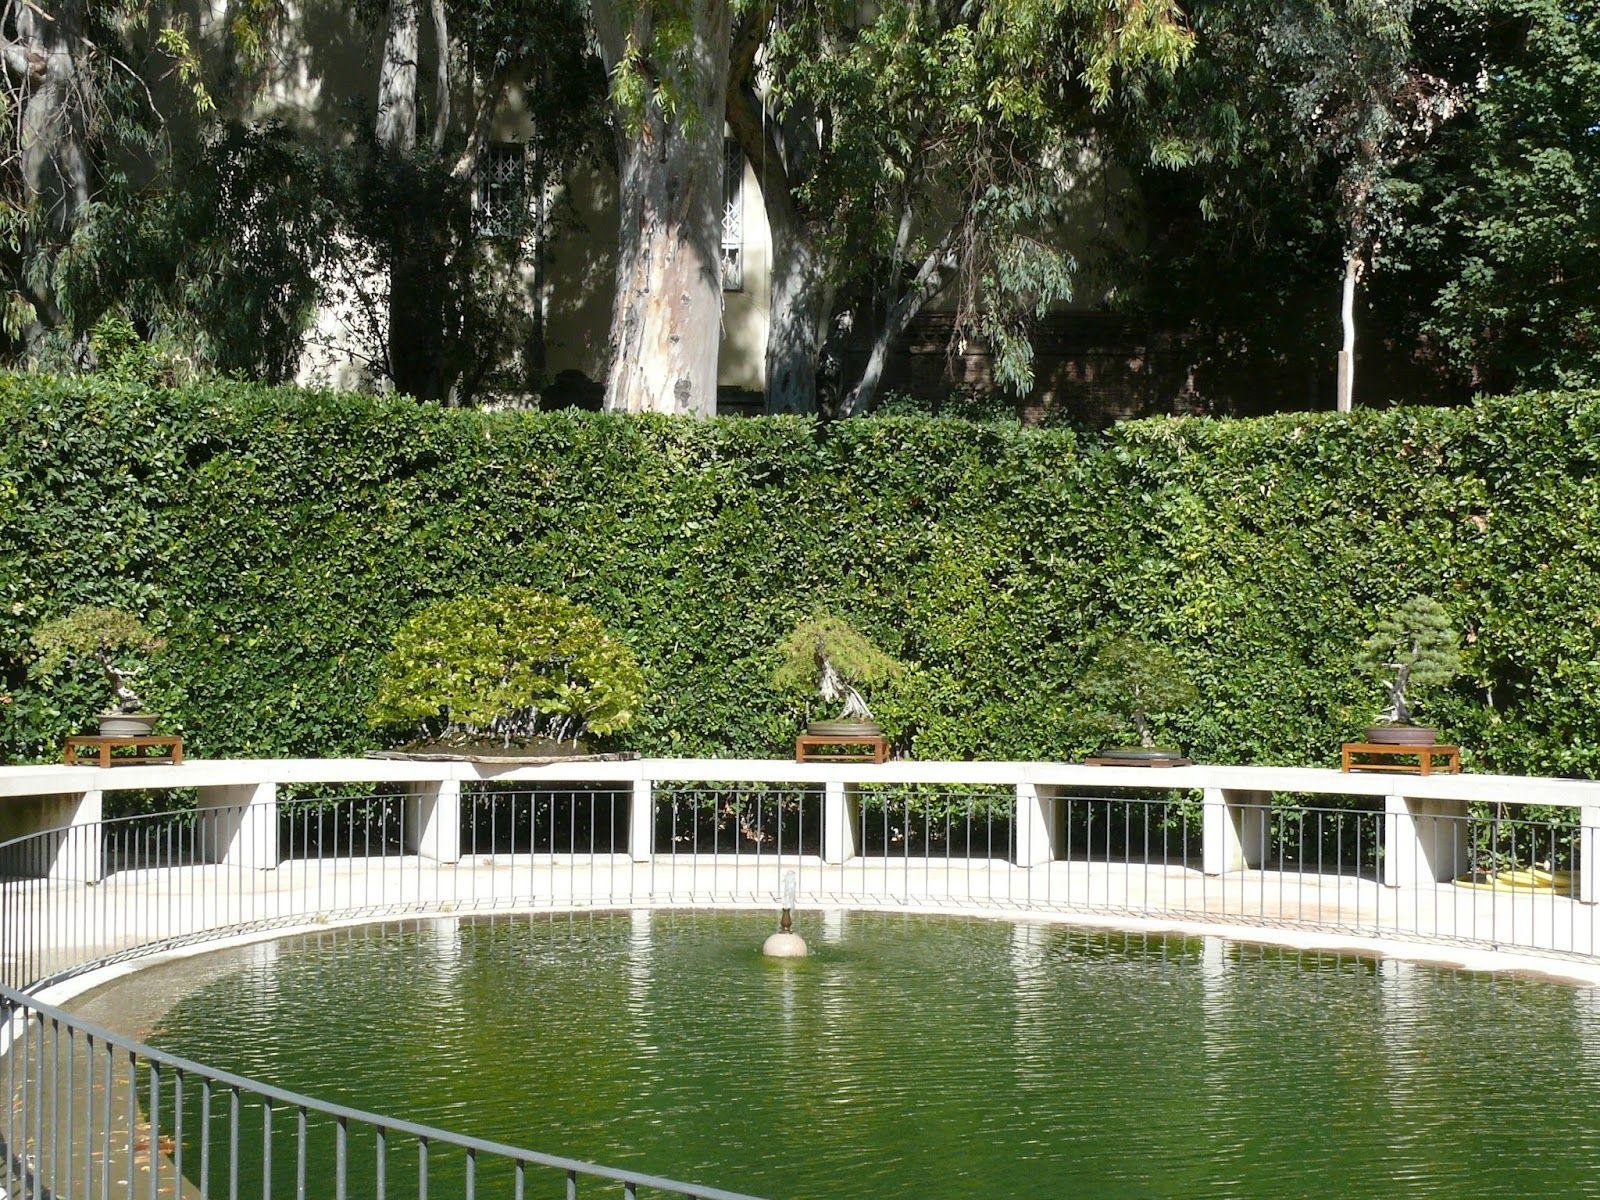 Terraza Alta O De Los Laureles Real Jardin Botanico De Madrid Real Jardin Botanico Arquitectura De Jardines Jardin Botanico